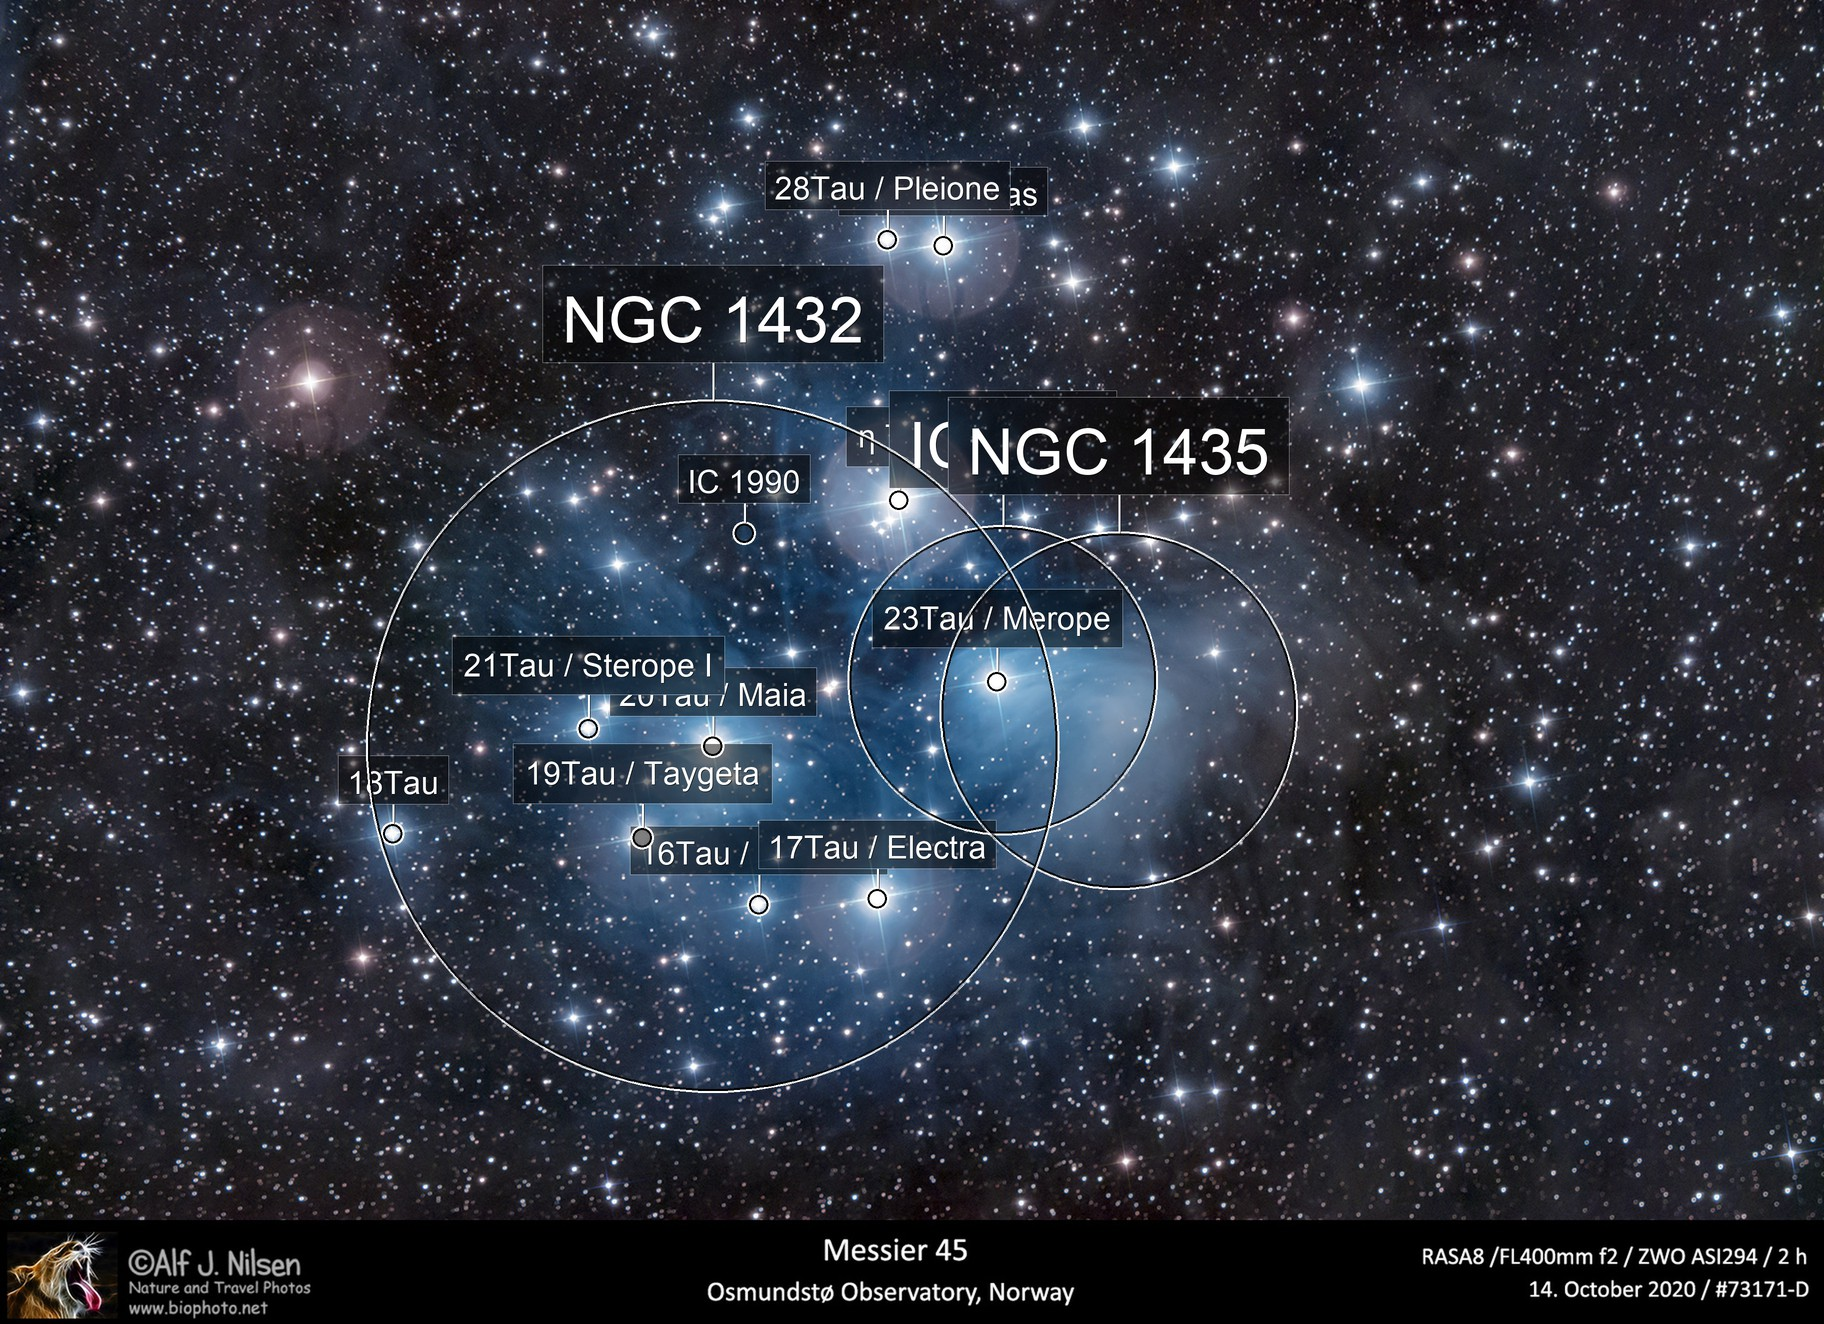 The Pleiades (Messier 45)